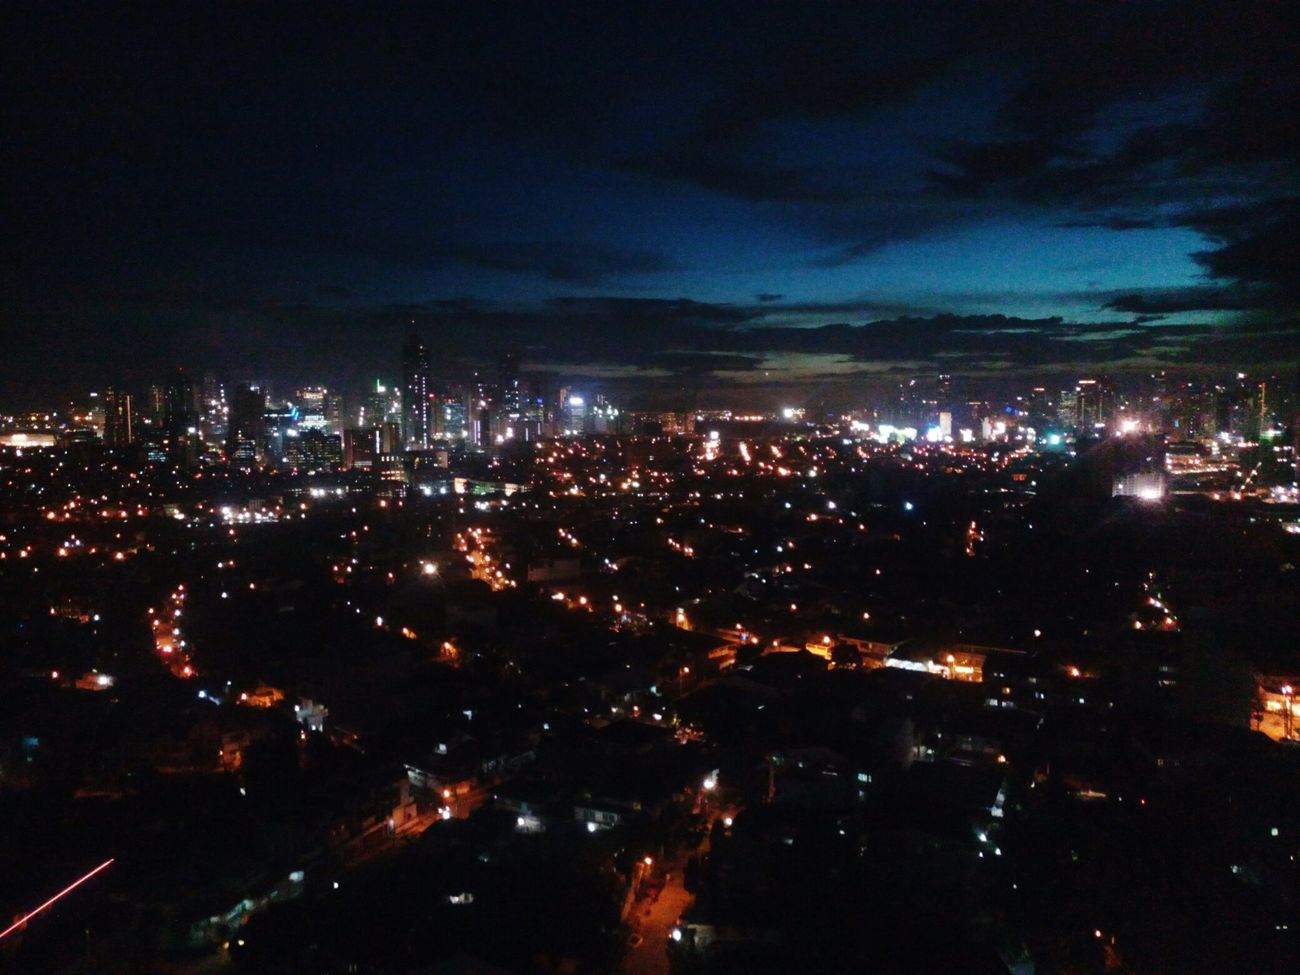 Freelance Life Nightlife Night Lights Timelinechanges Manila, Philippines Privatohotel